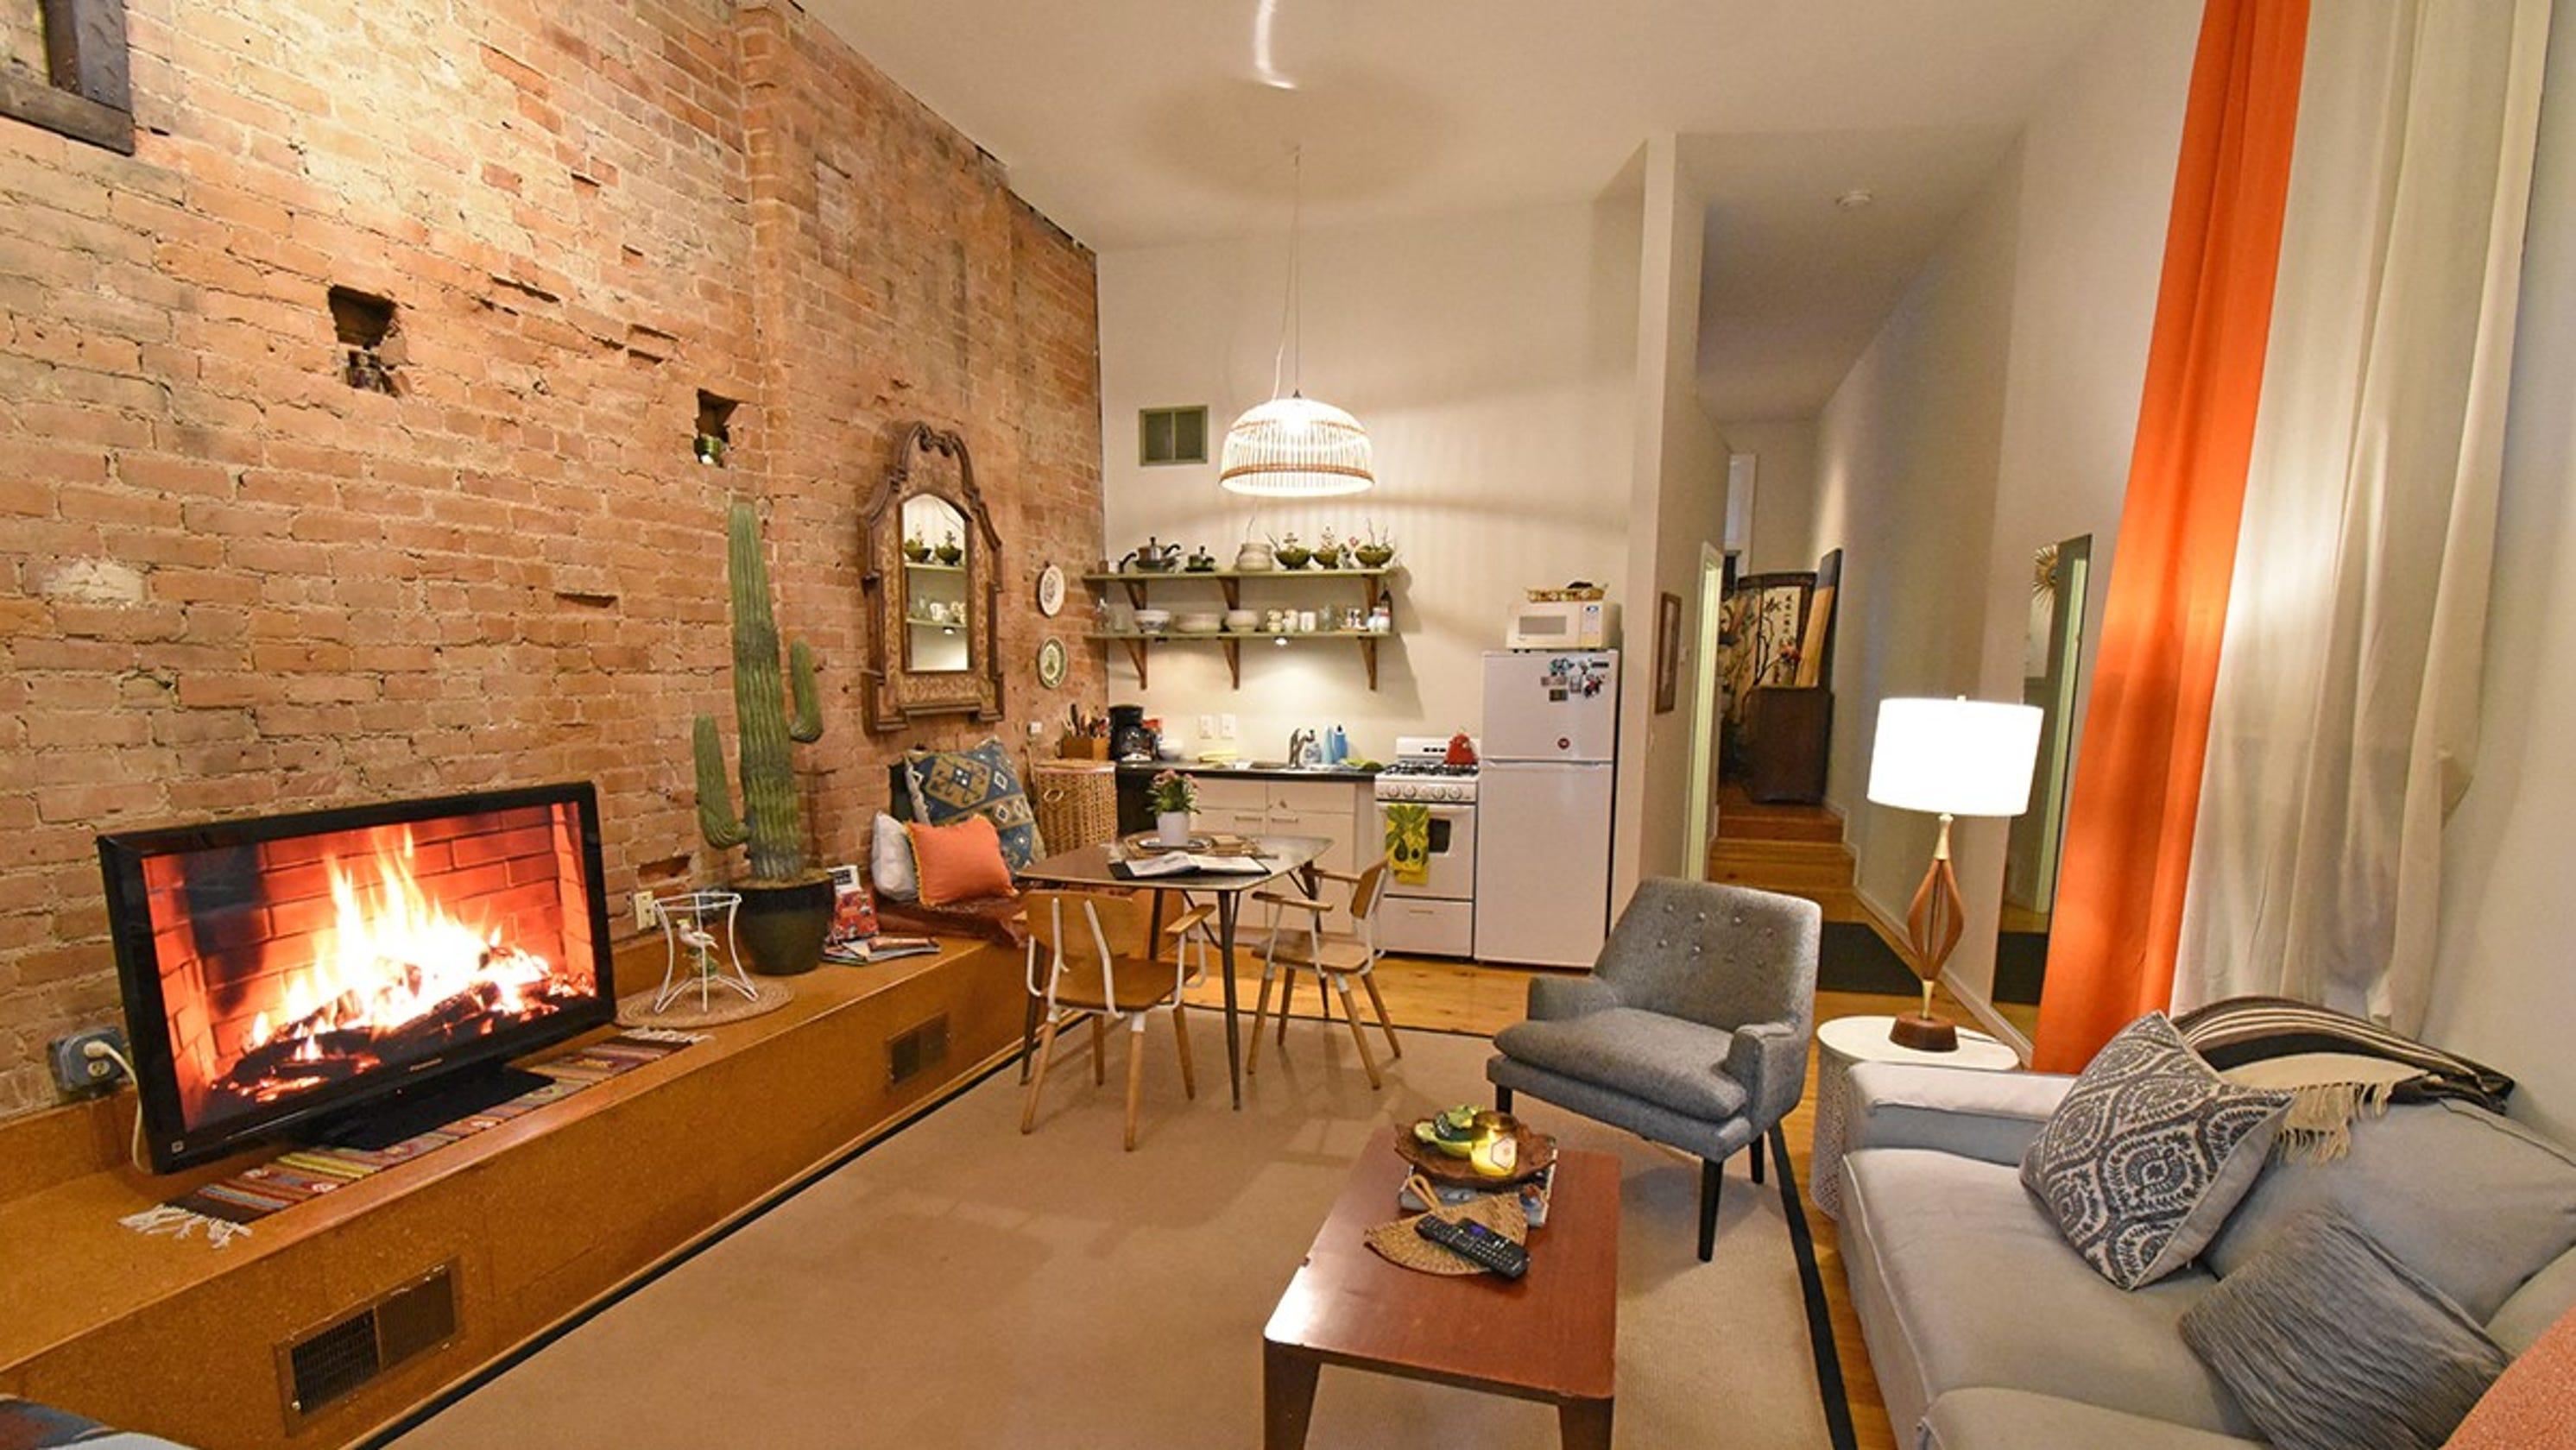 Cincinnati Airbnb: Most-coveted rental is a loft apartment